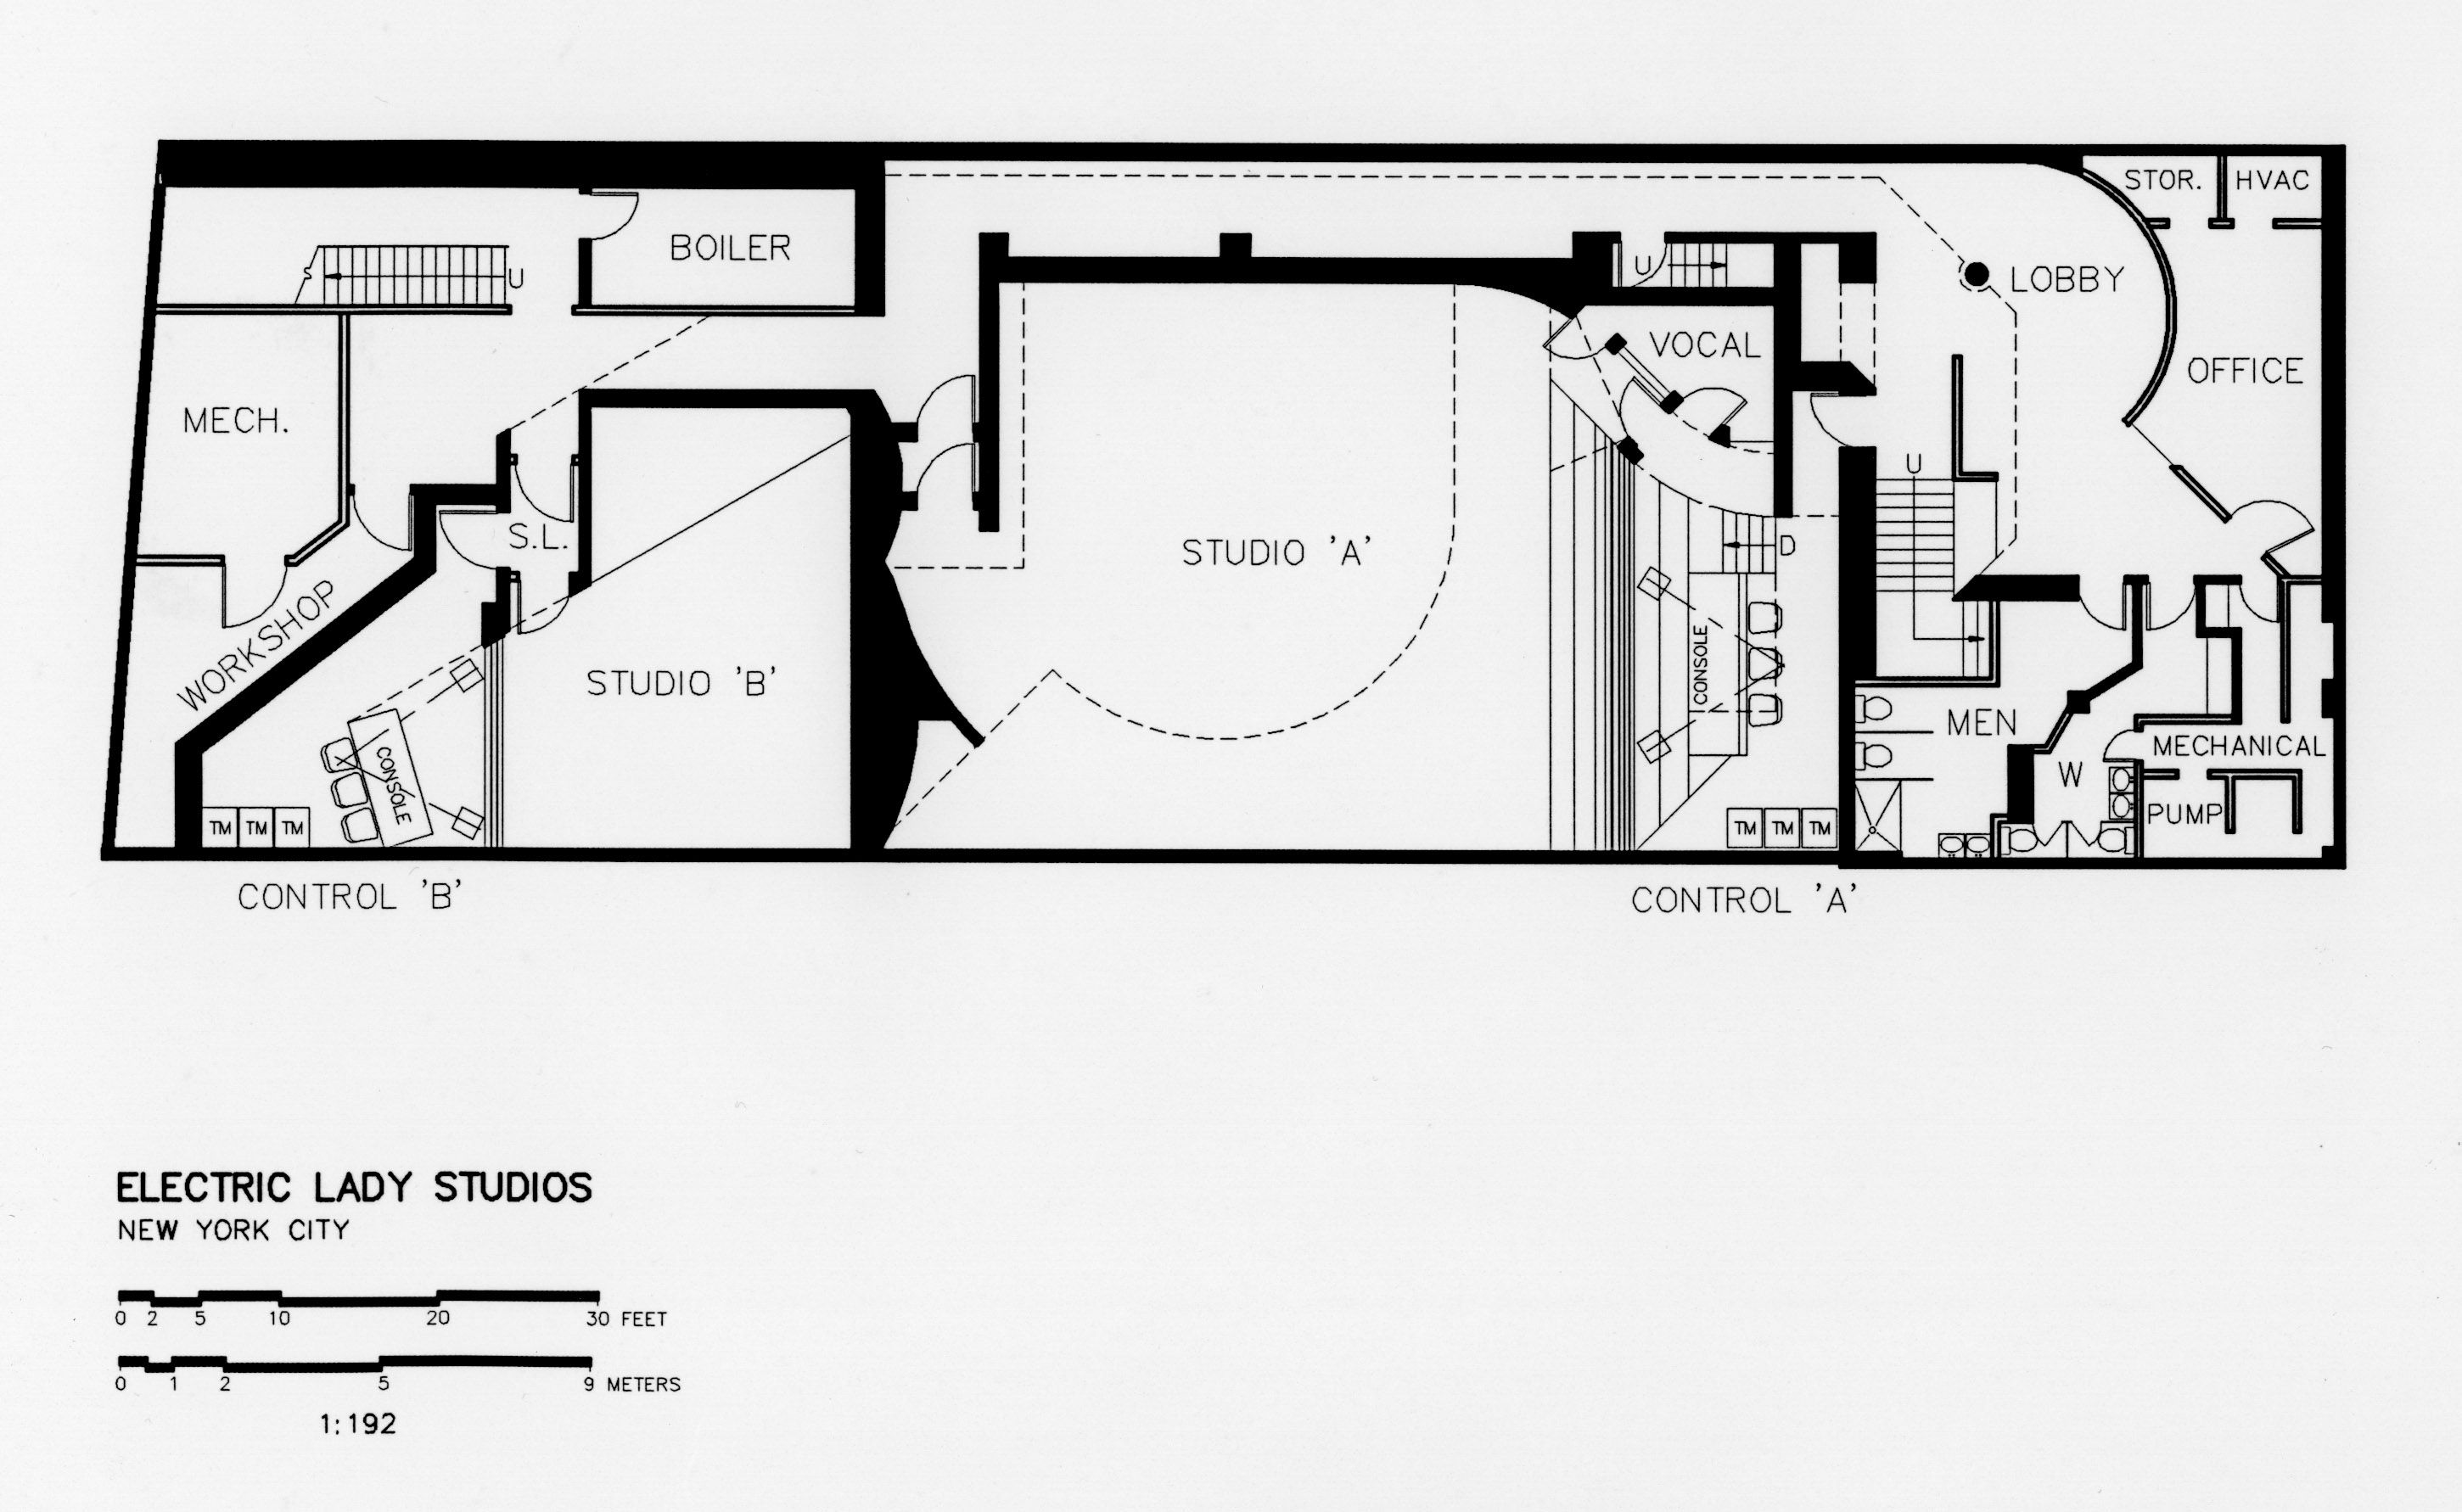 Basement Floor Plan Electric Lady Studios New York